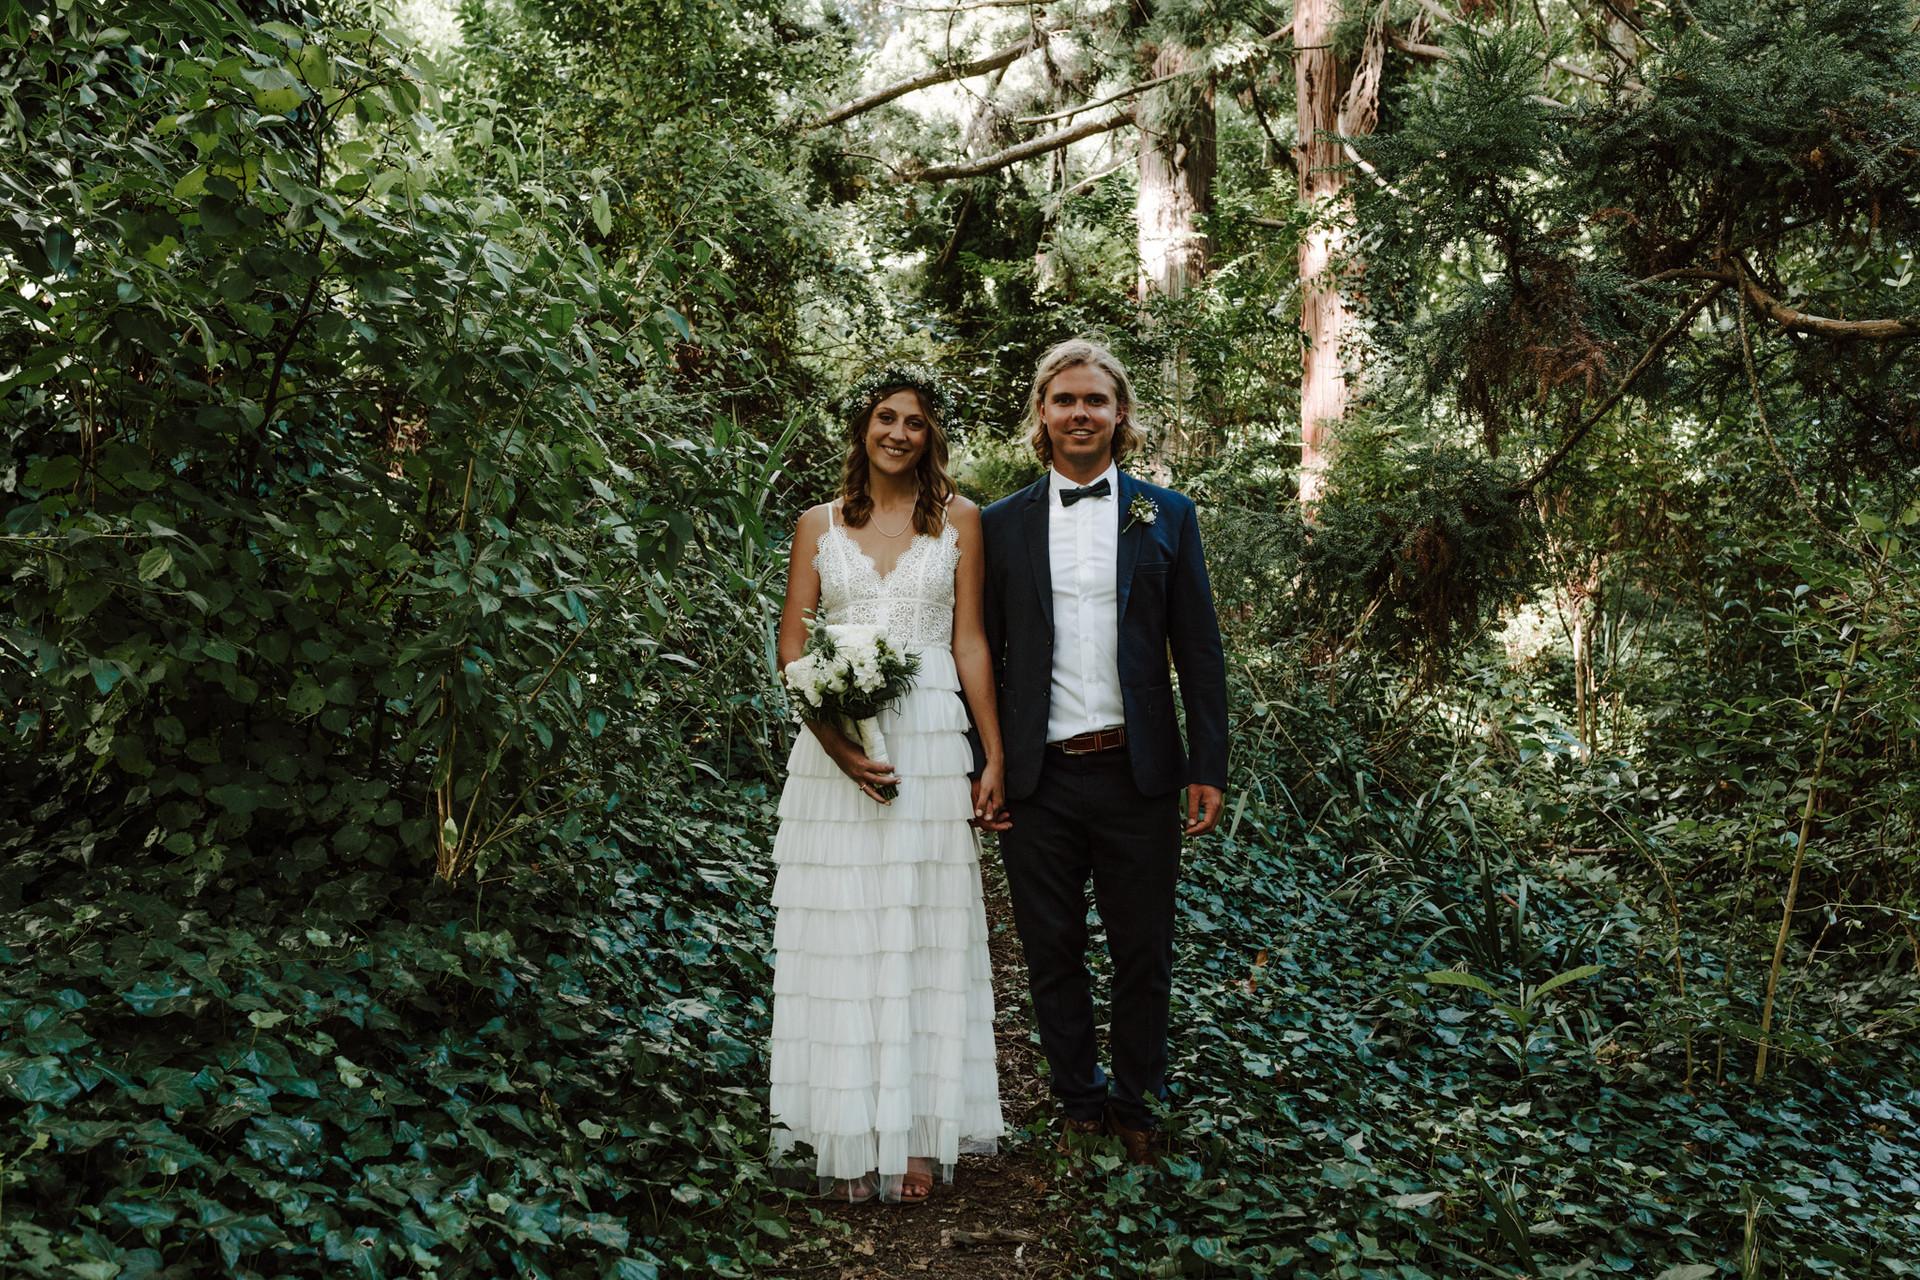 Madeline-and-Tom-4488.jpg